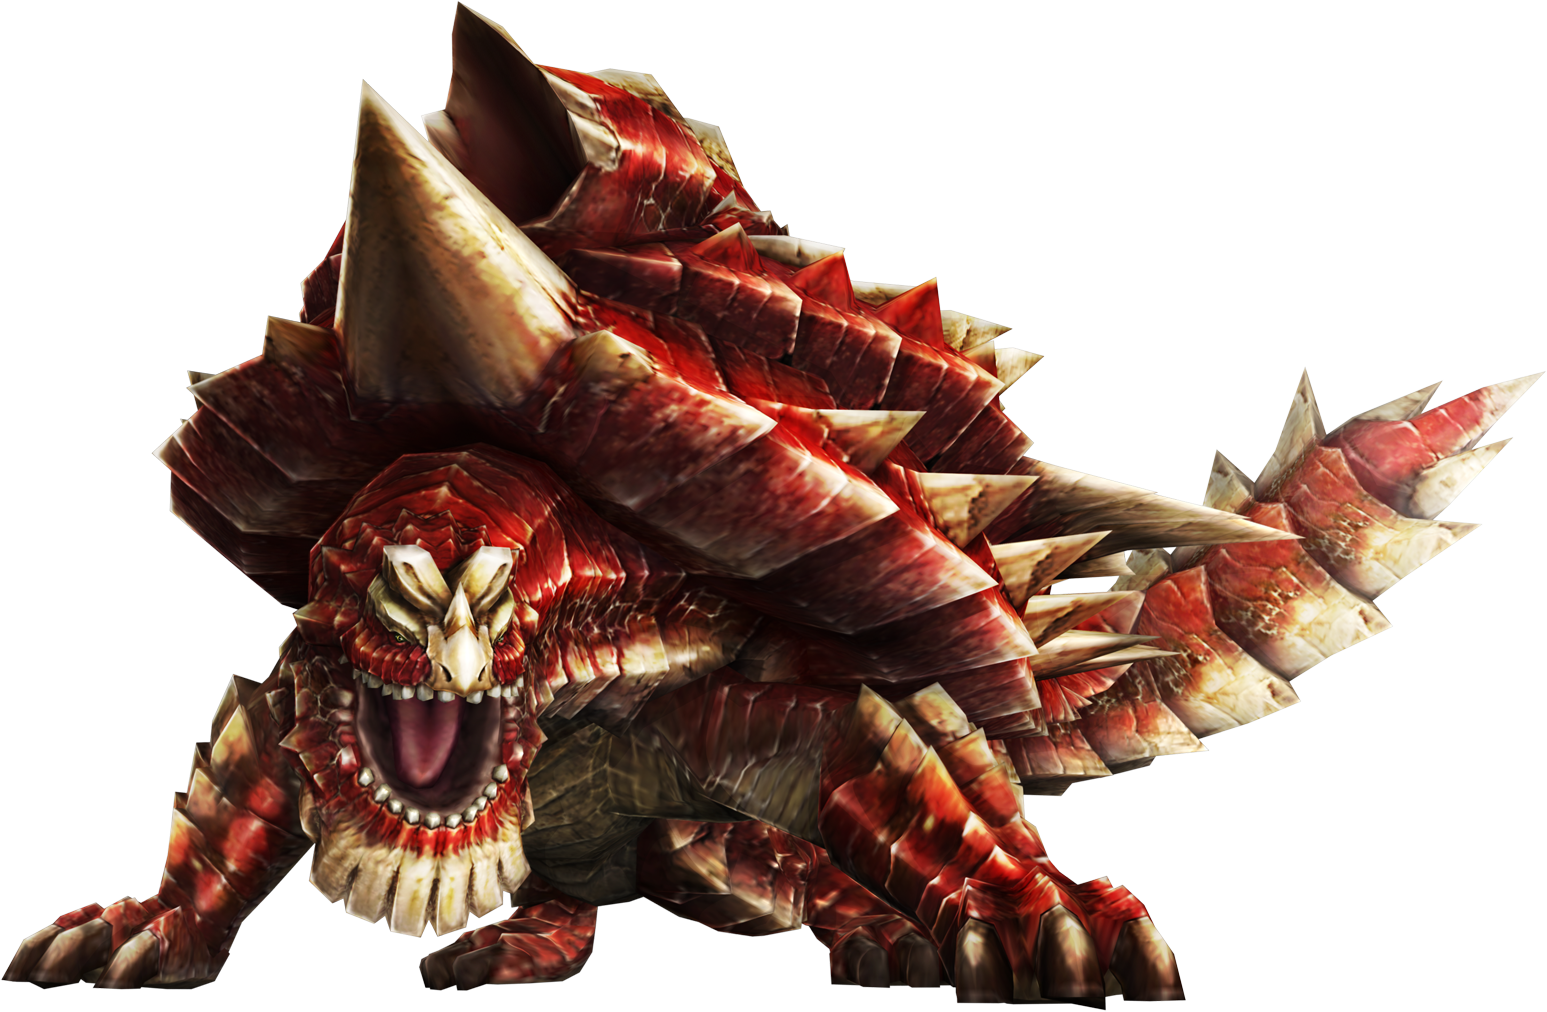 Odibatorasu Photo Gallery Monster Hunter Wiki Fandom In 2020 Monster Hunter Monster Hunter Frontier Monster Hunter Wiki